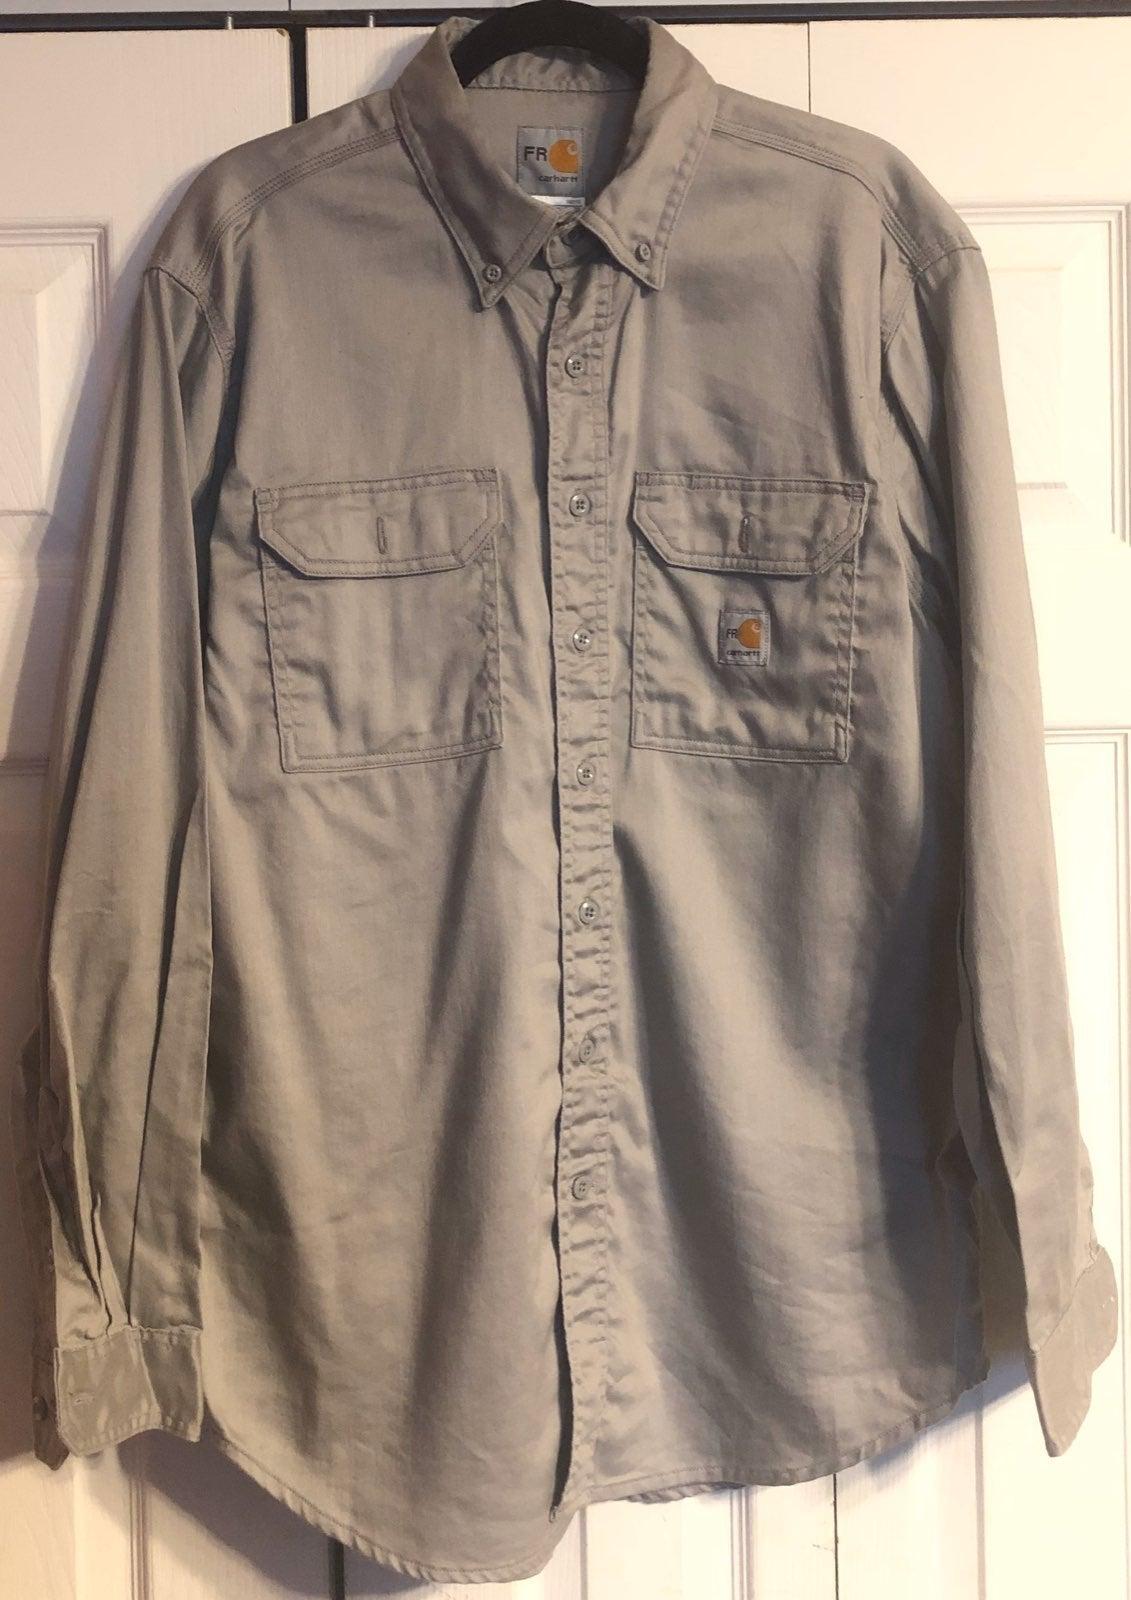 Carhartt Men's Flame Resistant Shirt, L